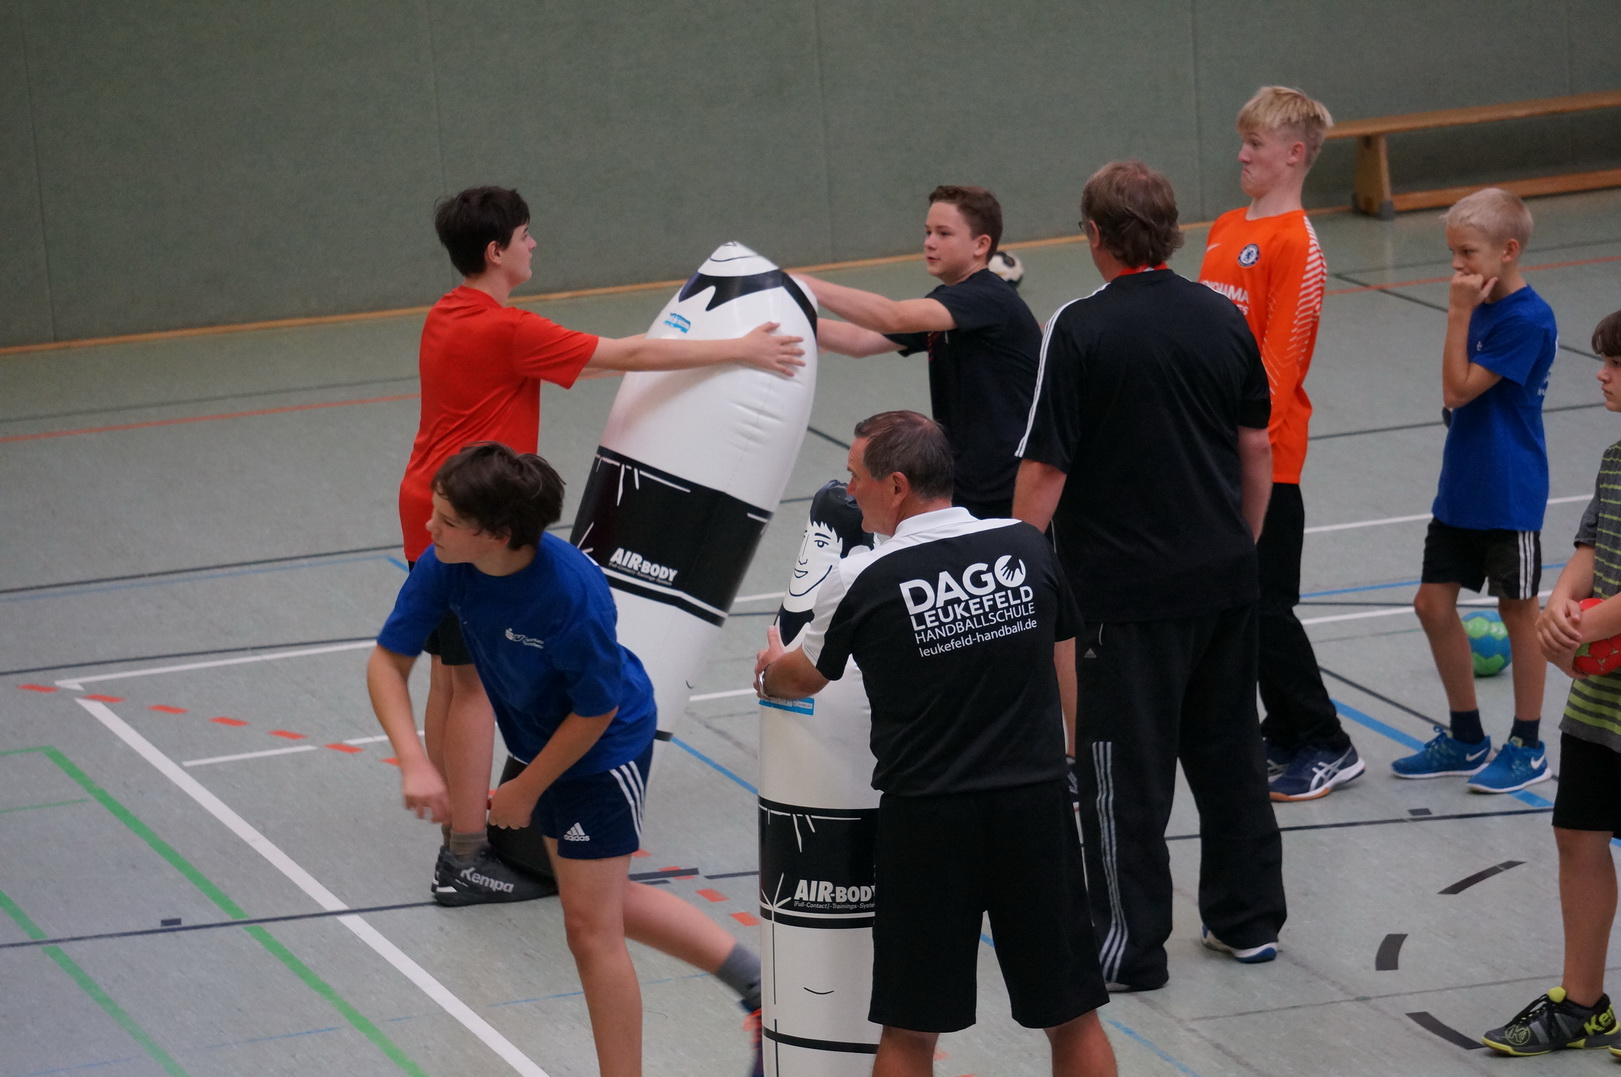 201808_Handballcamp_SDH_MG_236w